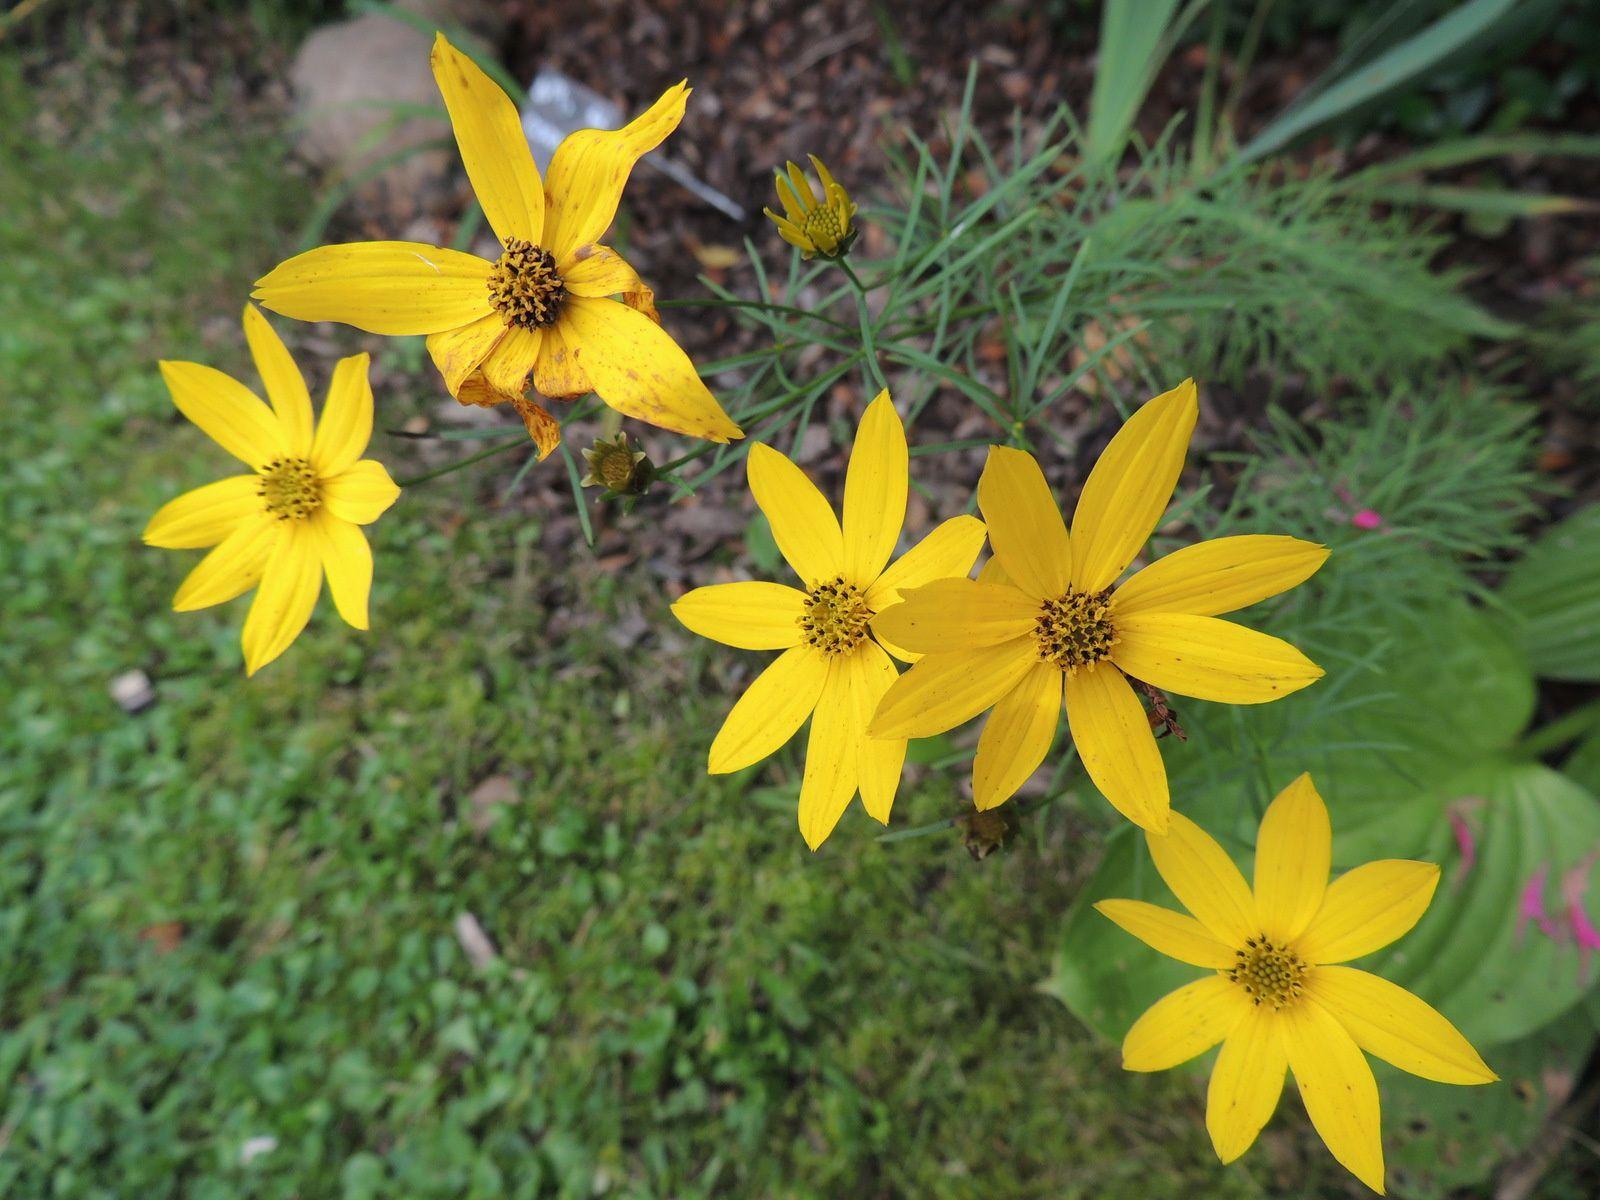 les coreopsis jaune